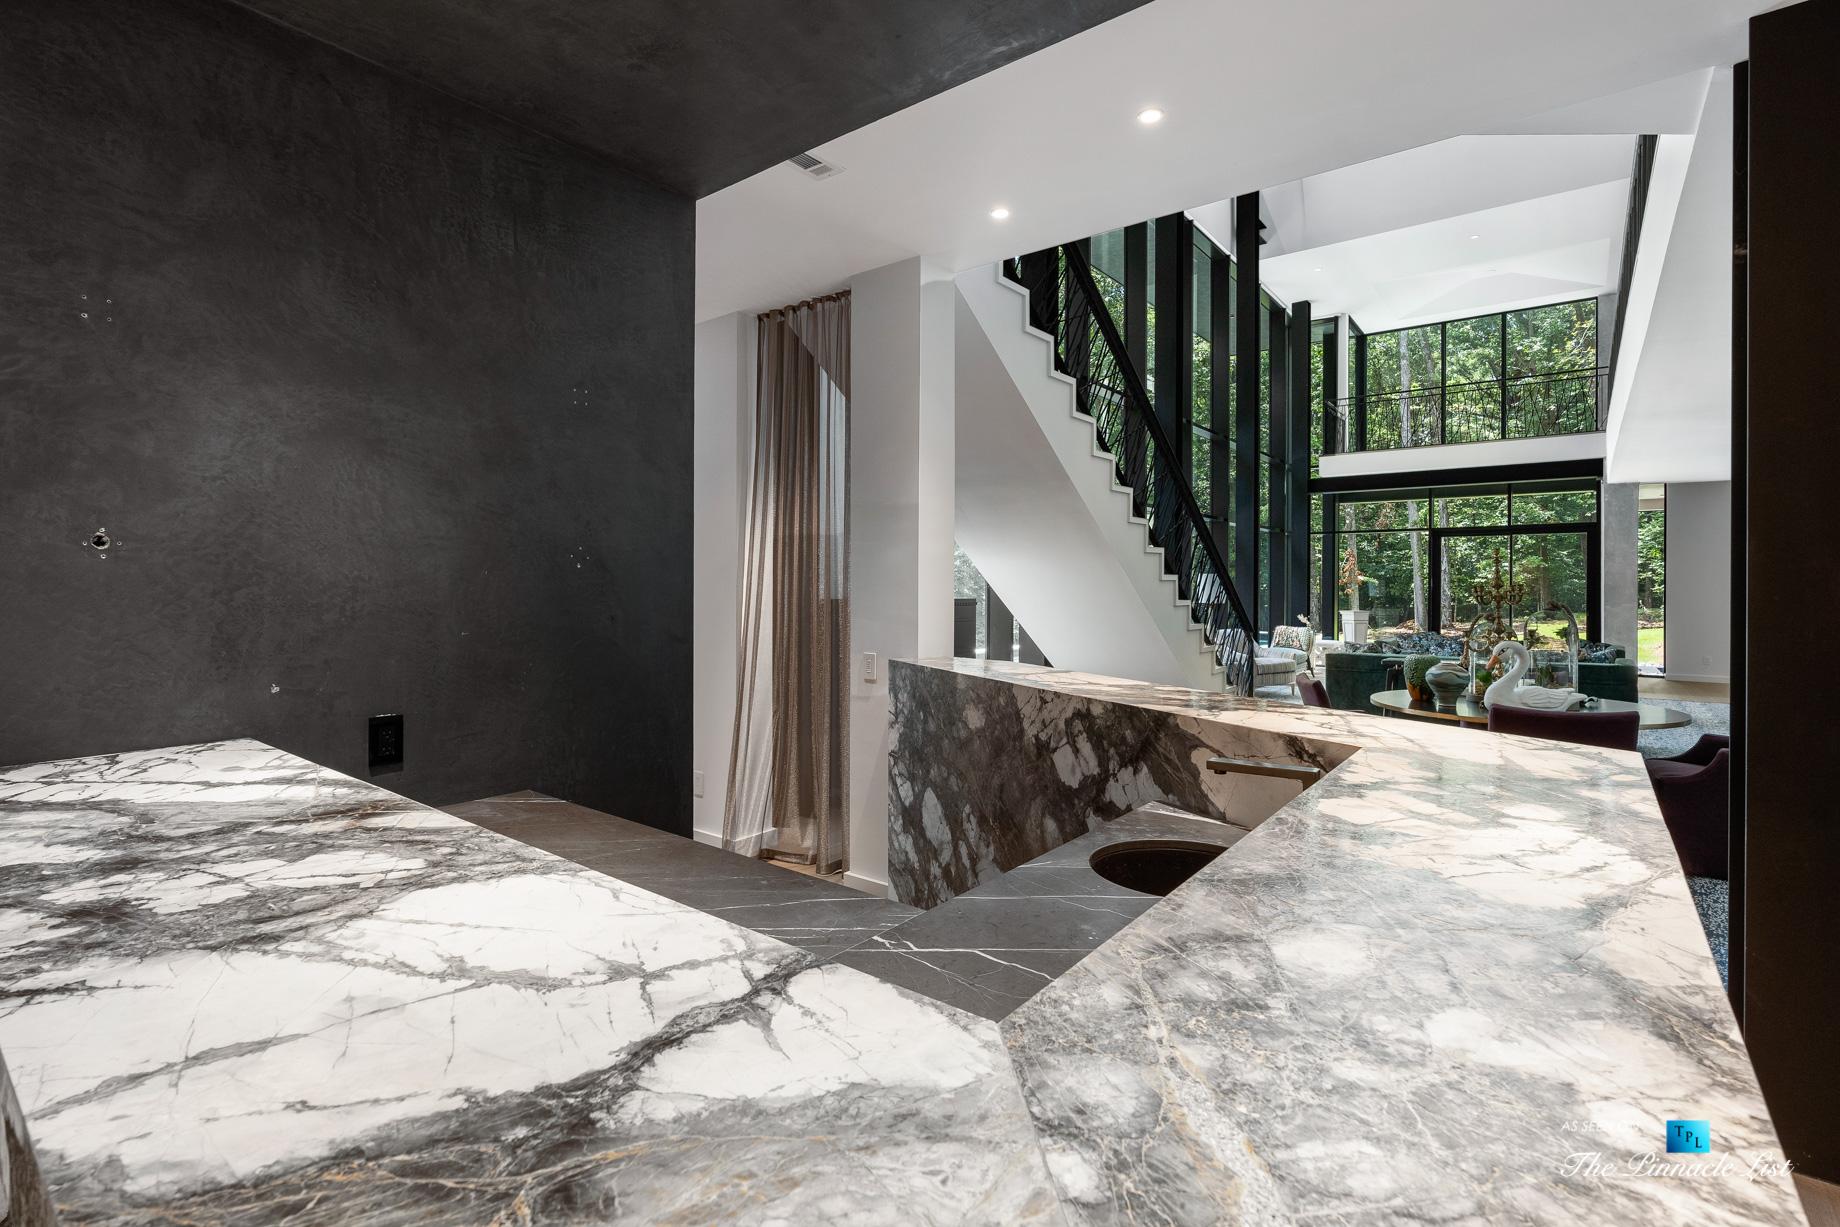 2716 Ridgewood Rd NW, Atlanta, GA, USA – Bar – Luxury Real Estate – Modern Contemporary Buckhead Home